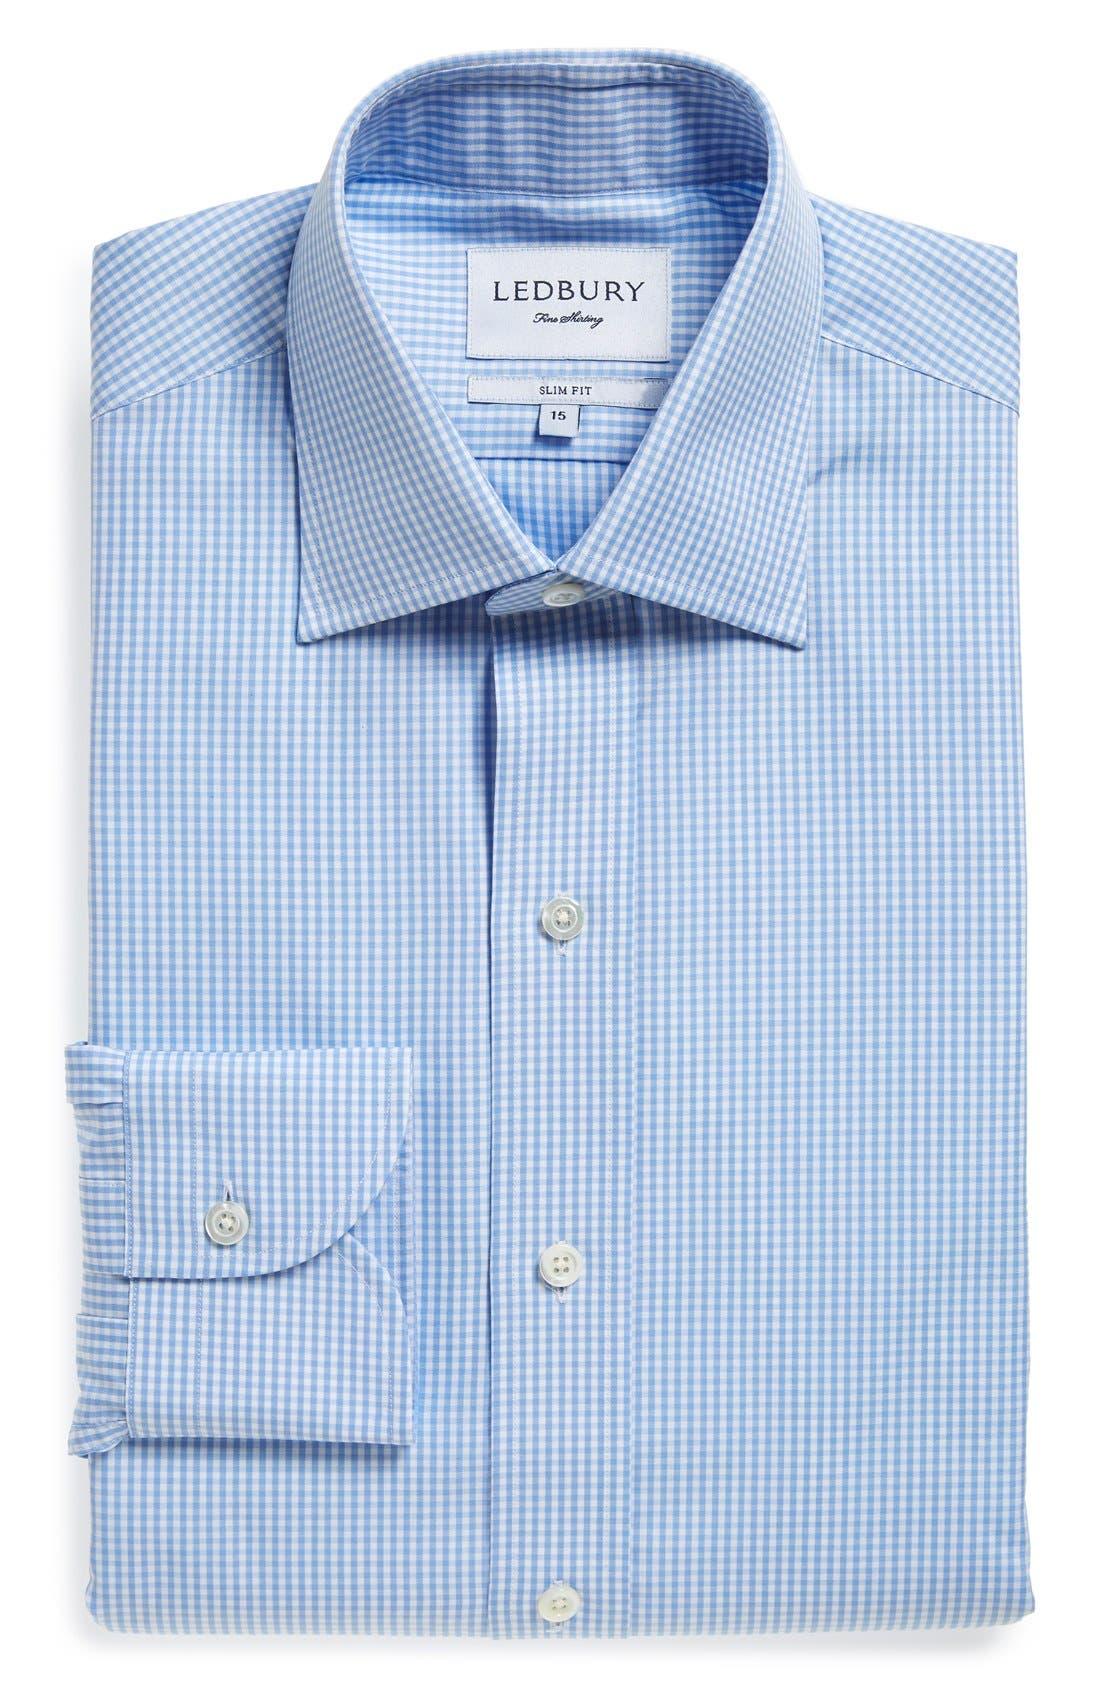 'Blue Gingham' Slim Fit Check Dress Shirt,                             Main thumbnail 1, color,                             Blue